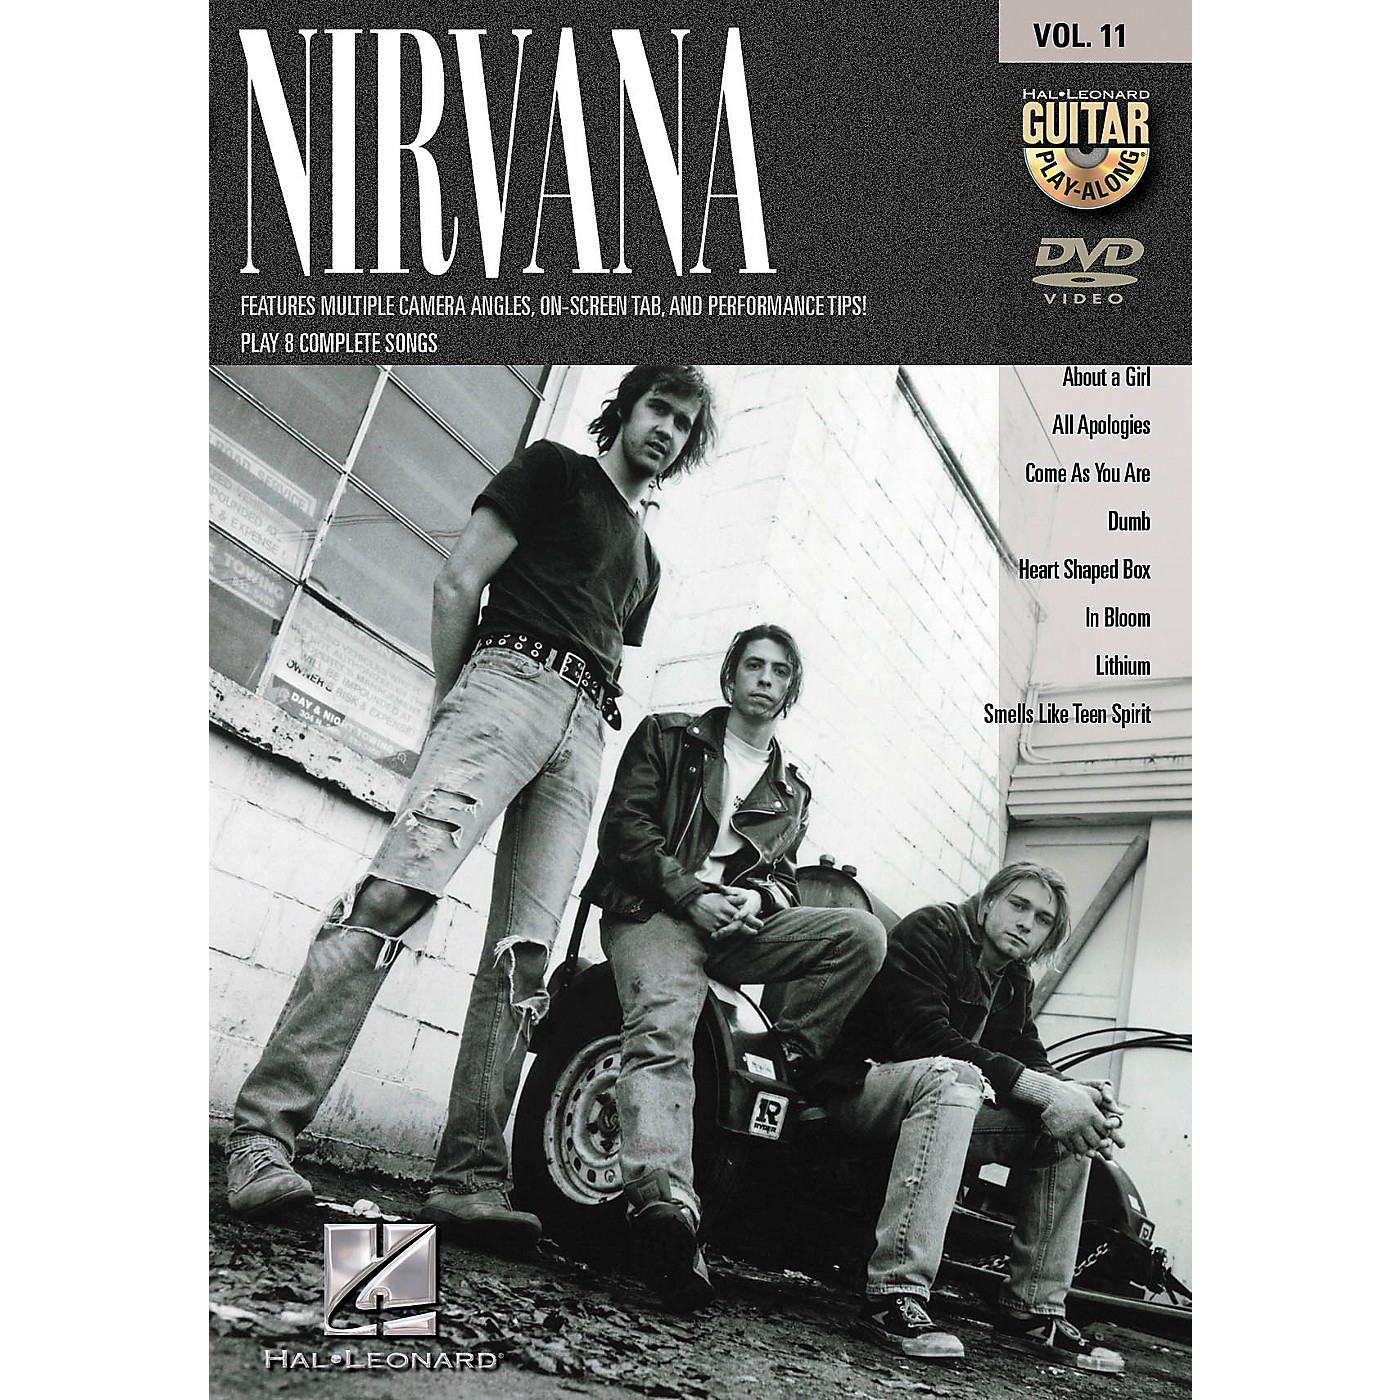 Hal Leonard NIRVANA - GUITAR PLAY-ALONG SERIES ON DVD VOLUME 11 thumbnail